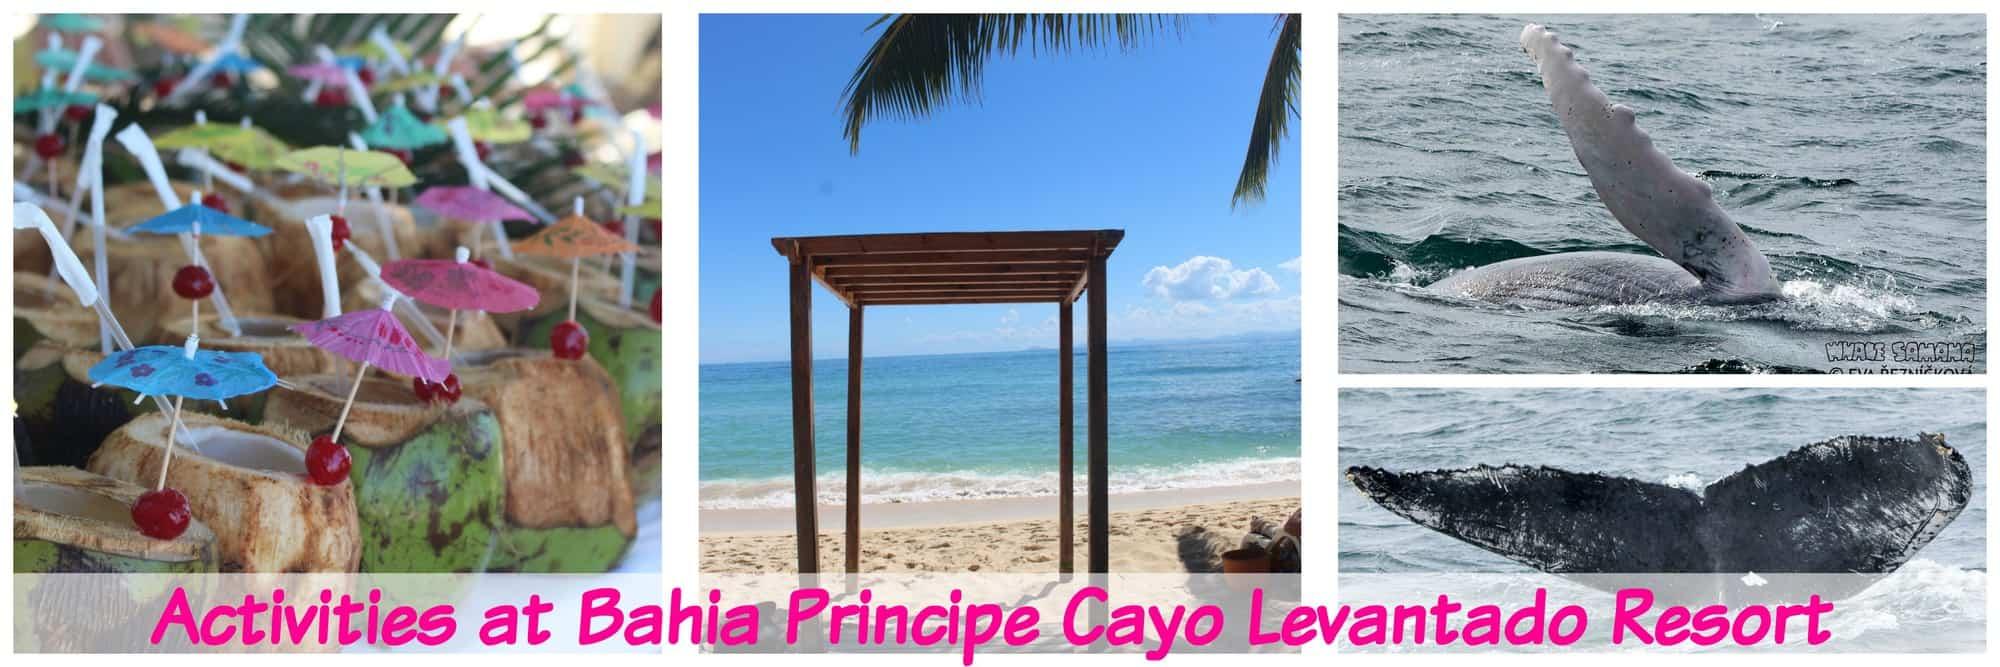 9 Amazing Bahia Principe Cayo Levantado Resort Activities